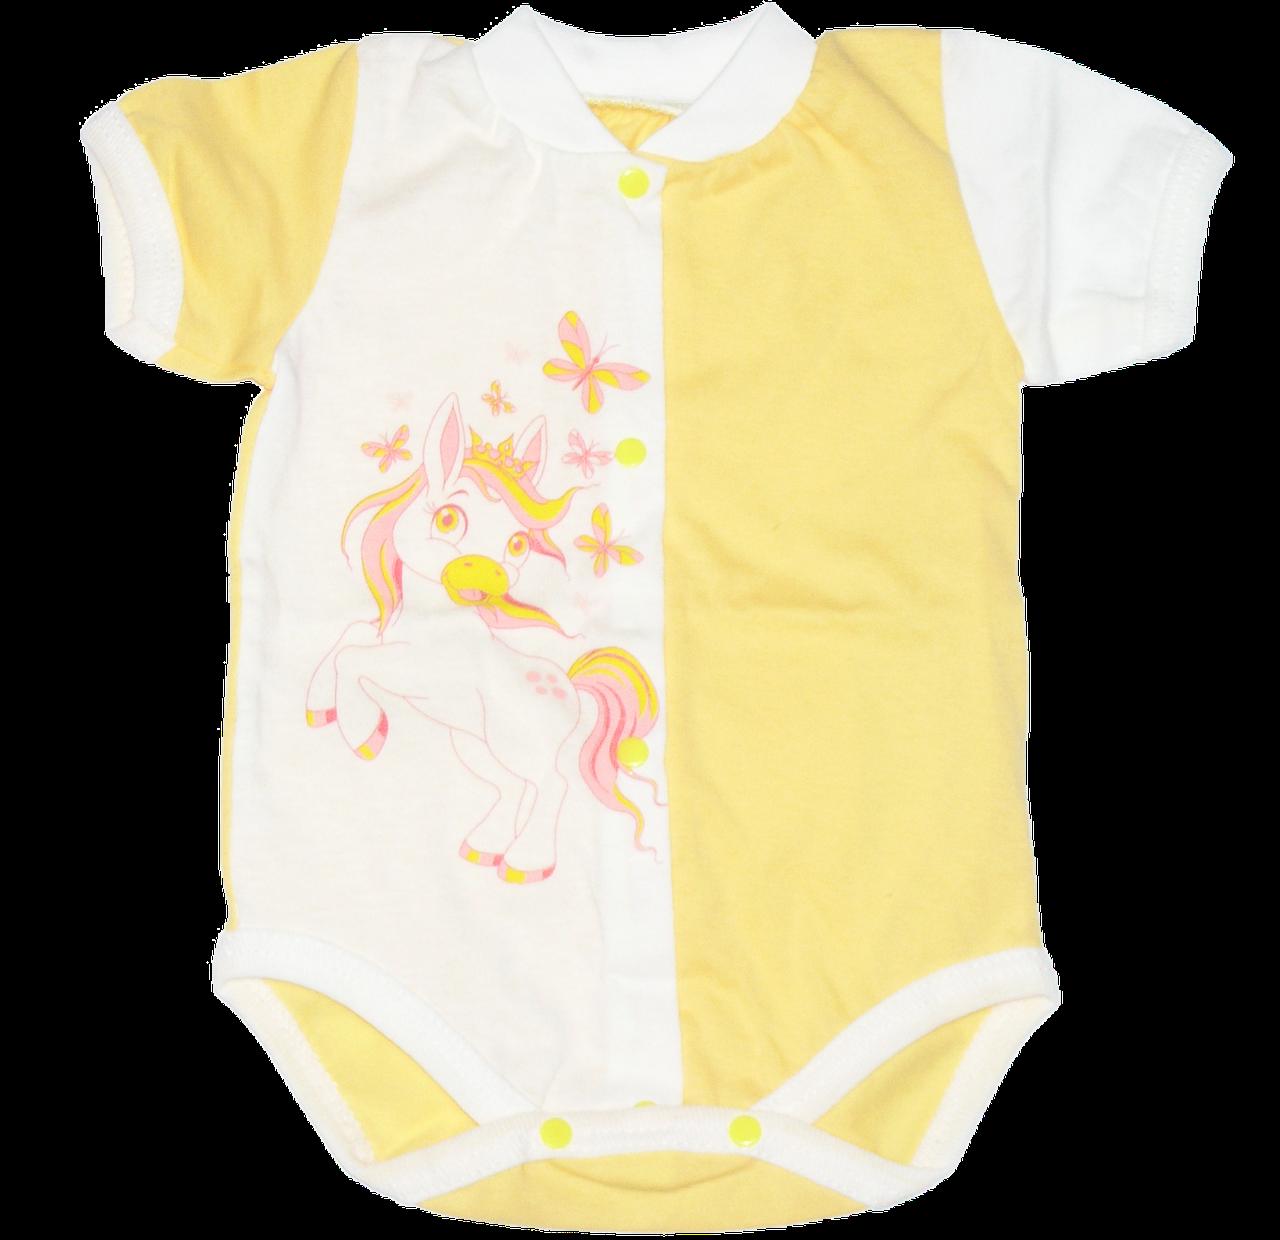 Детский боди-футболка р. 62 ткань КУЛИР 100% тонкий хлопок ТМ Незабудка 3080 Желтый